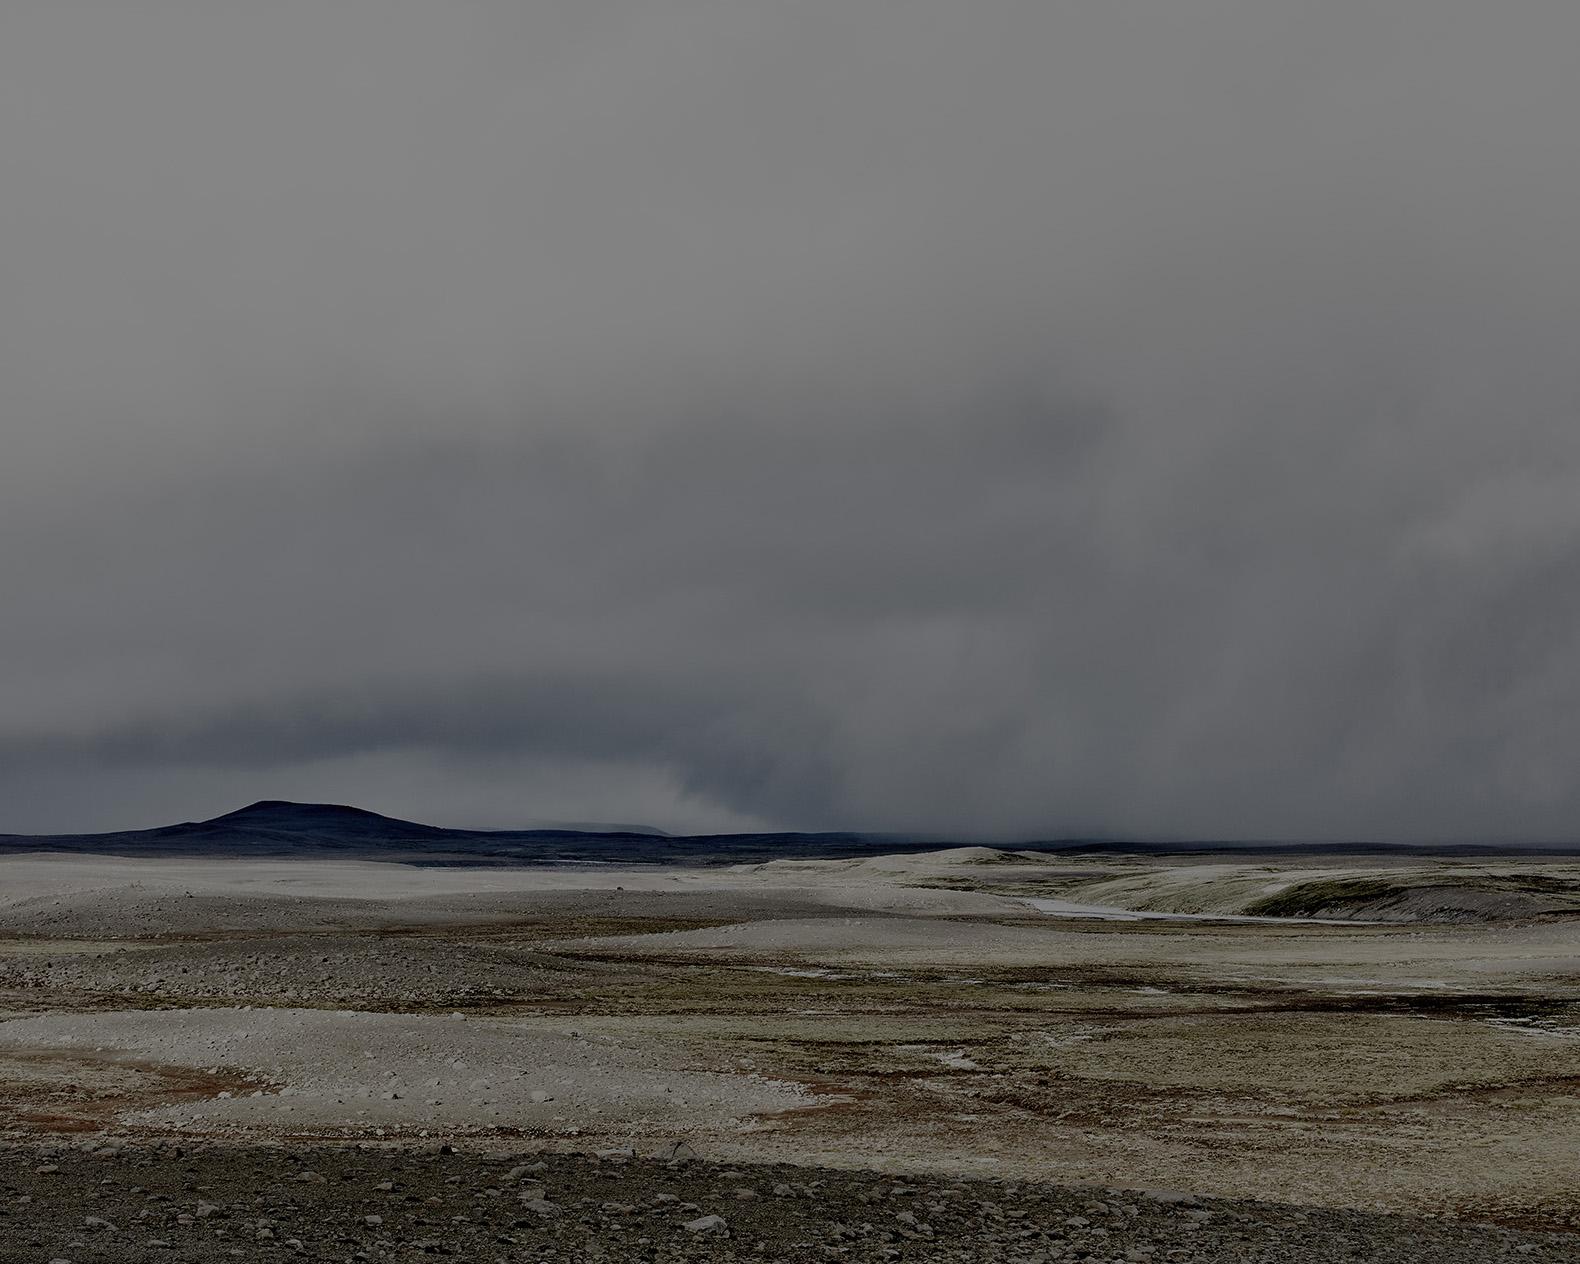 Patrick_Schuttler_Landscape_003.jpg